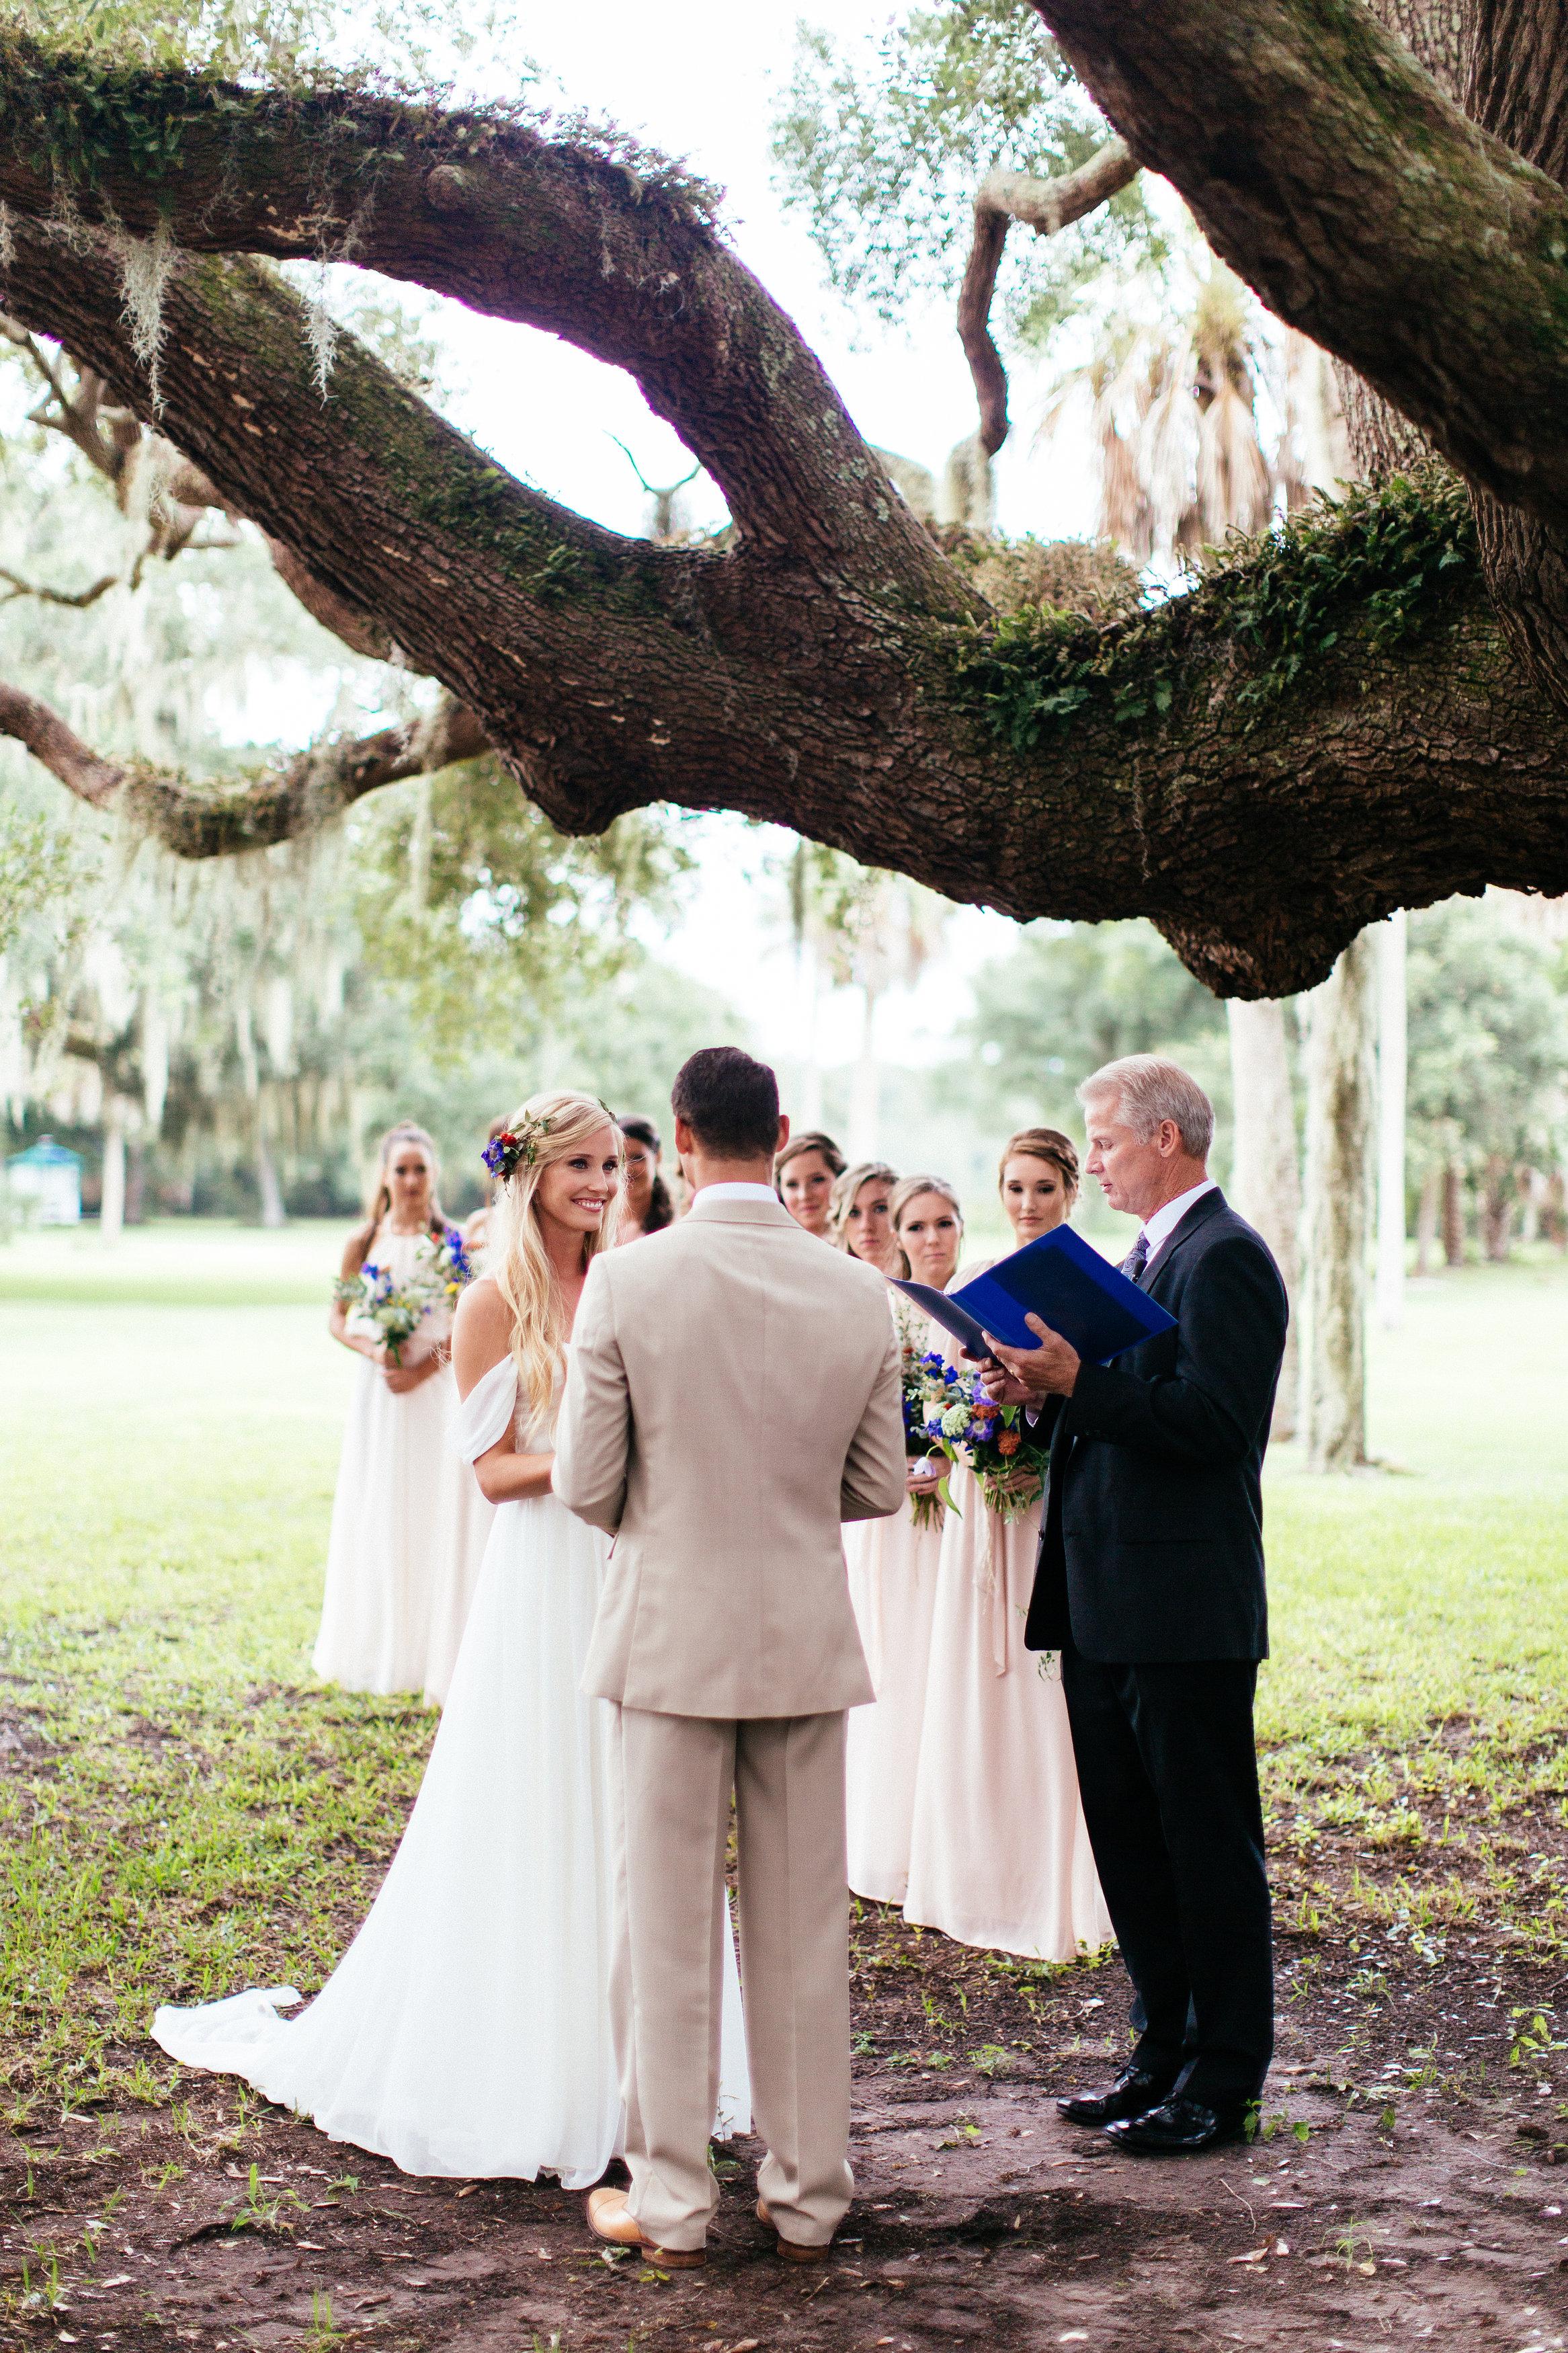 christina-karst-photography-ivory-and-beau-bridal-boutique-sarah-seven-lafayette-boho-bride-boho-bridal-boutique-indie-bridal-boutique-savannah-bridal-boutique-savannah-wedding-dresses-savannah-bridal-gowns-11.jpg